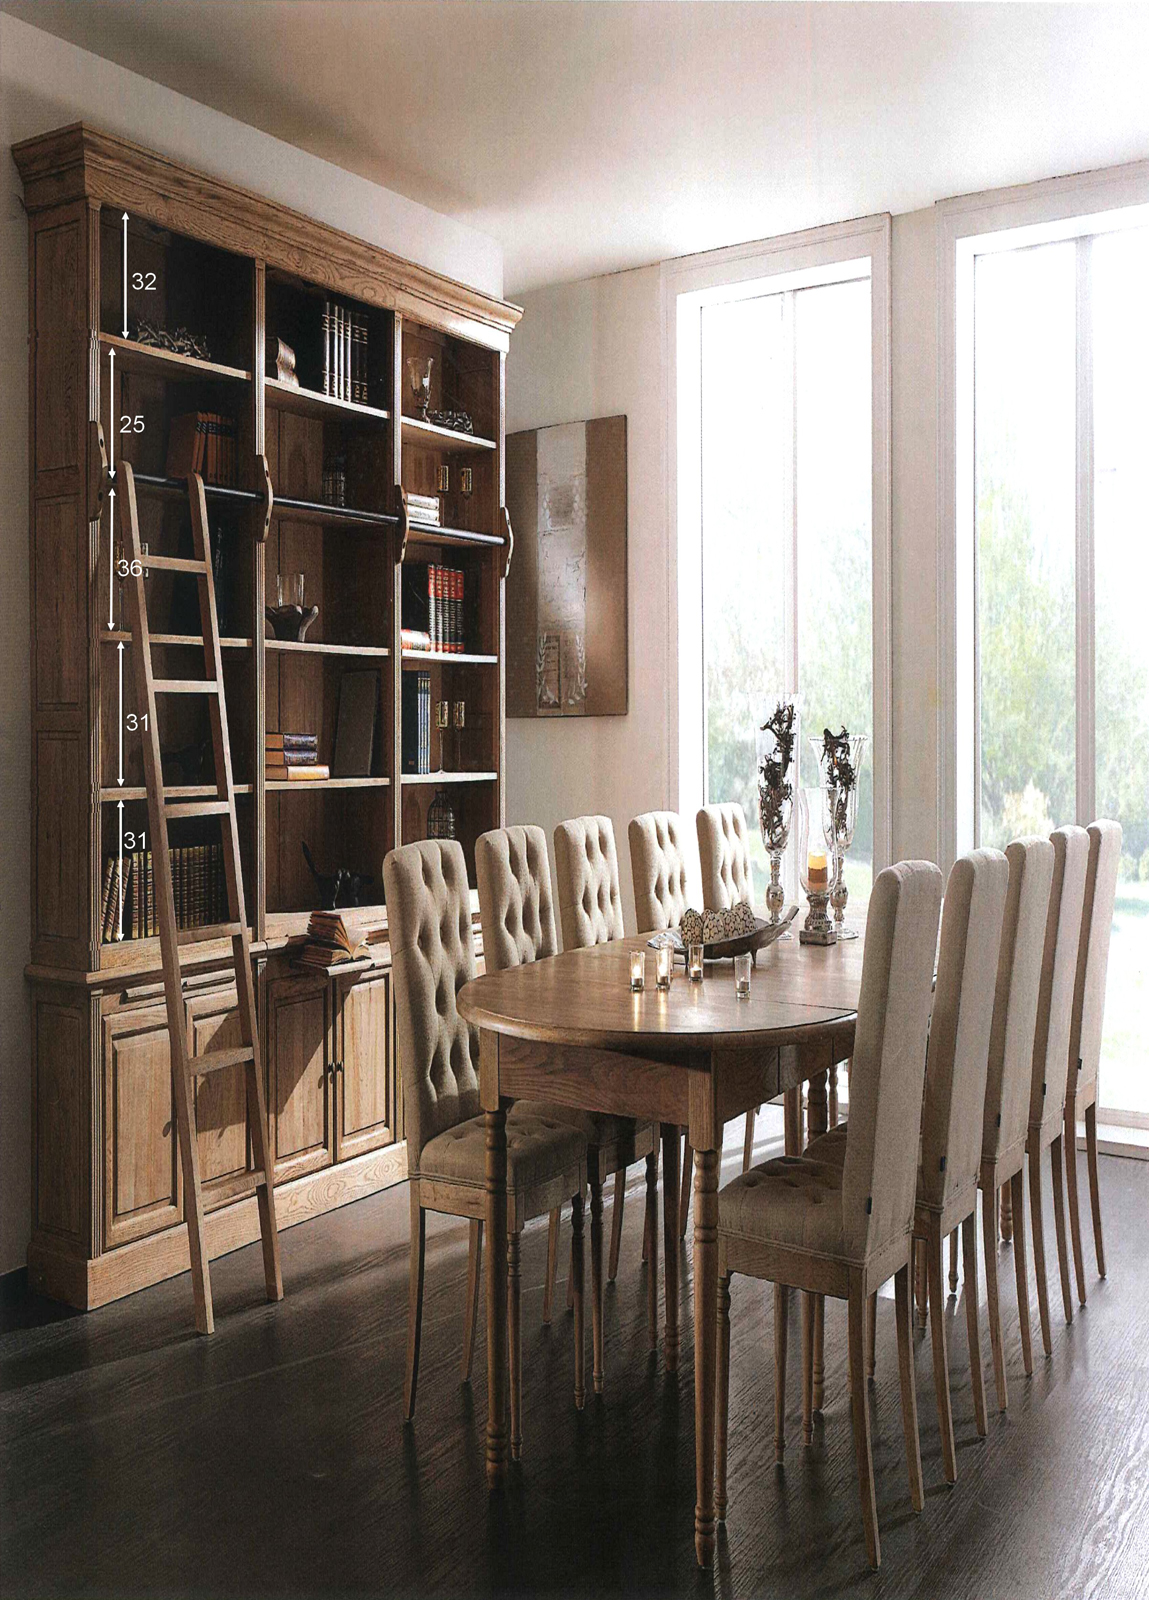 biblioth que avec chelle classique chic ch ne. Black Bedroom Furniture Sets. Home Design Ideas